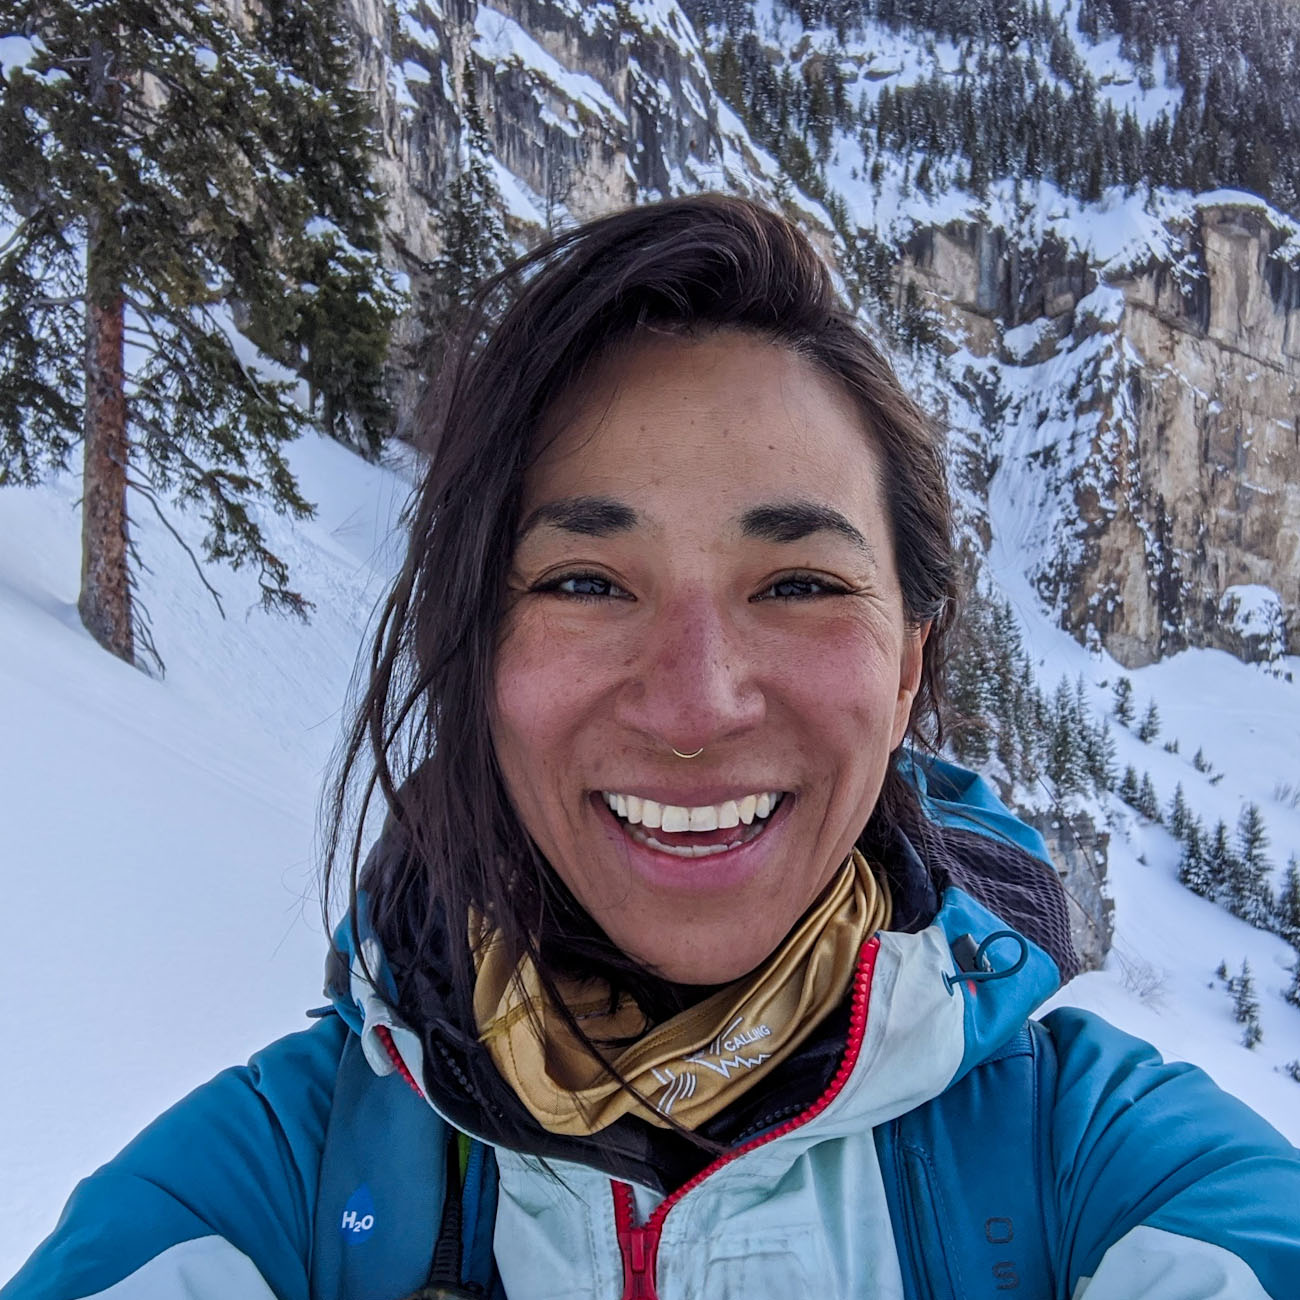 Dani Reyes-Acosta Idaho